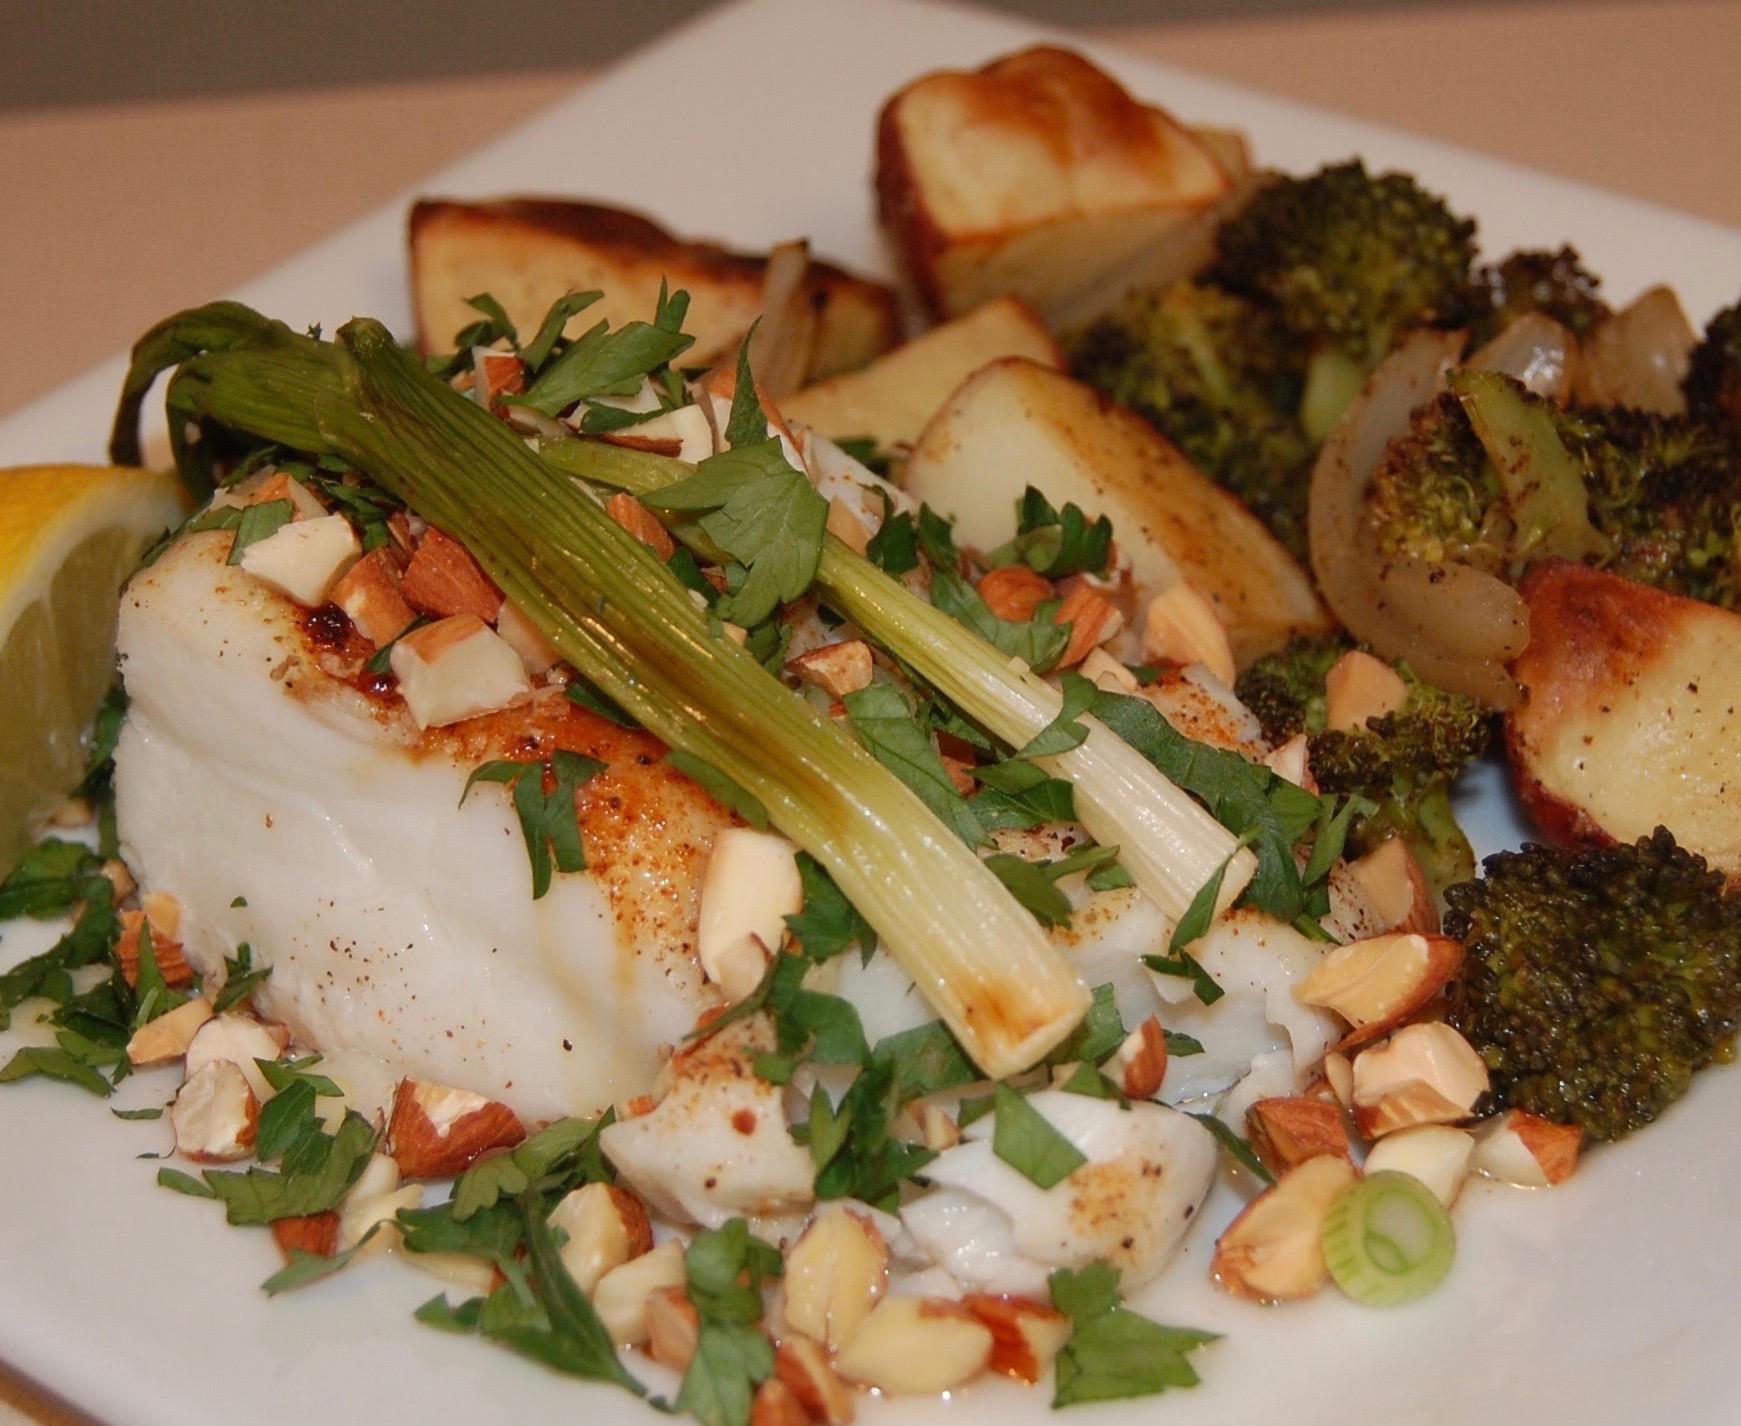 Roasted Cod w Scallions%2c Potatoes & Broccoli.JPG